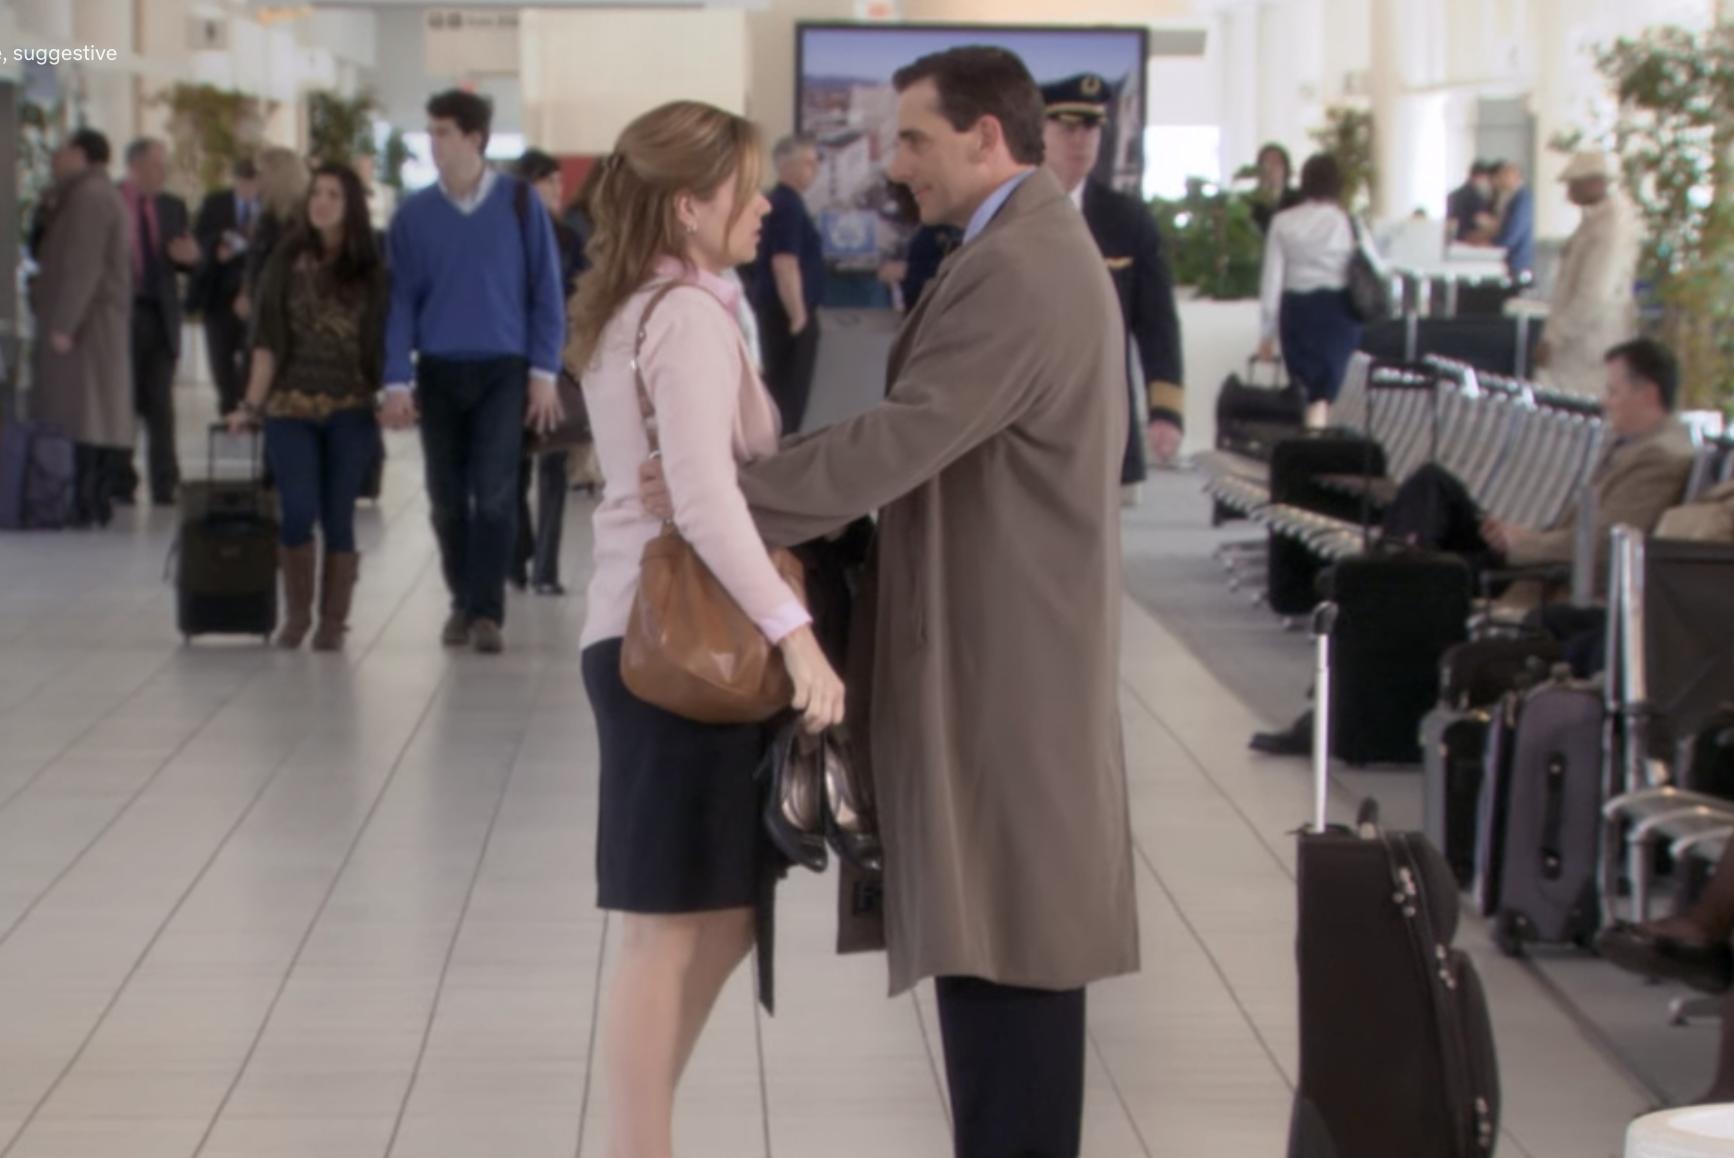 Pam hugs Michael goodbye